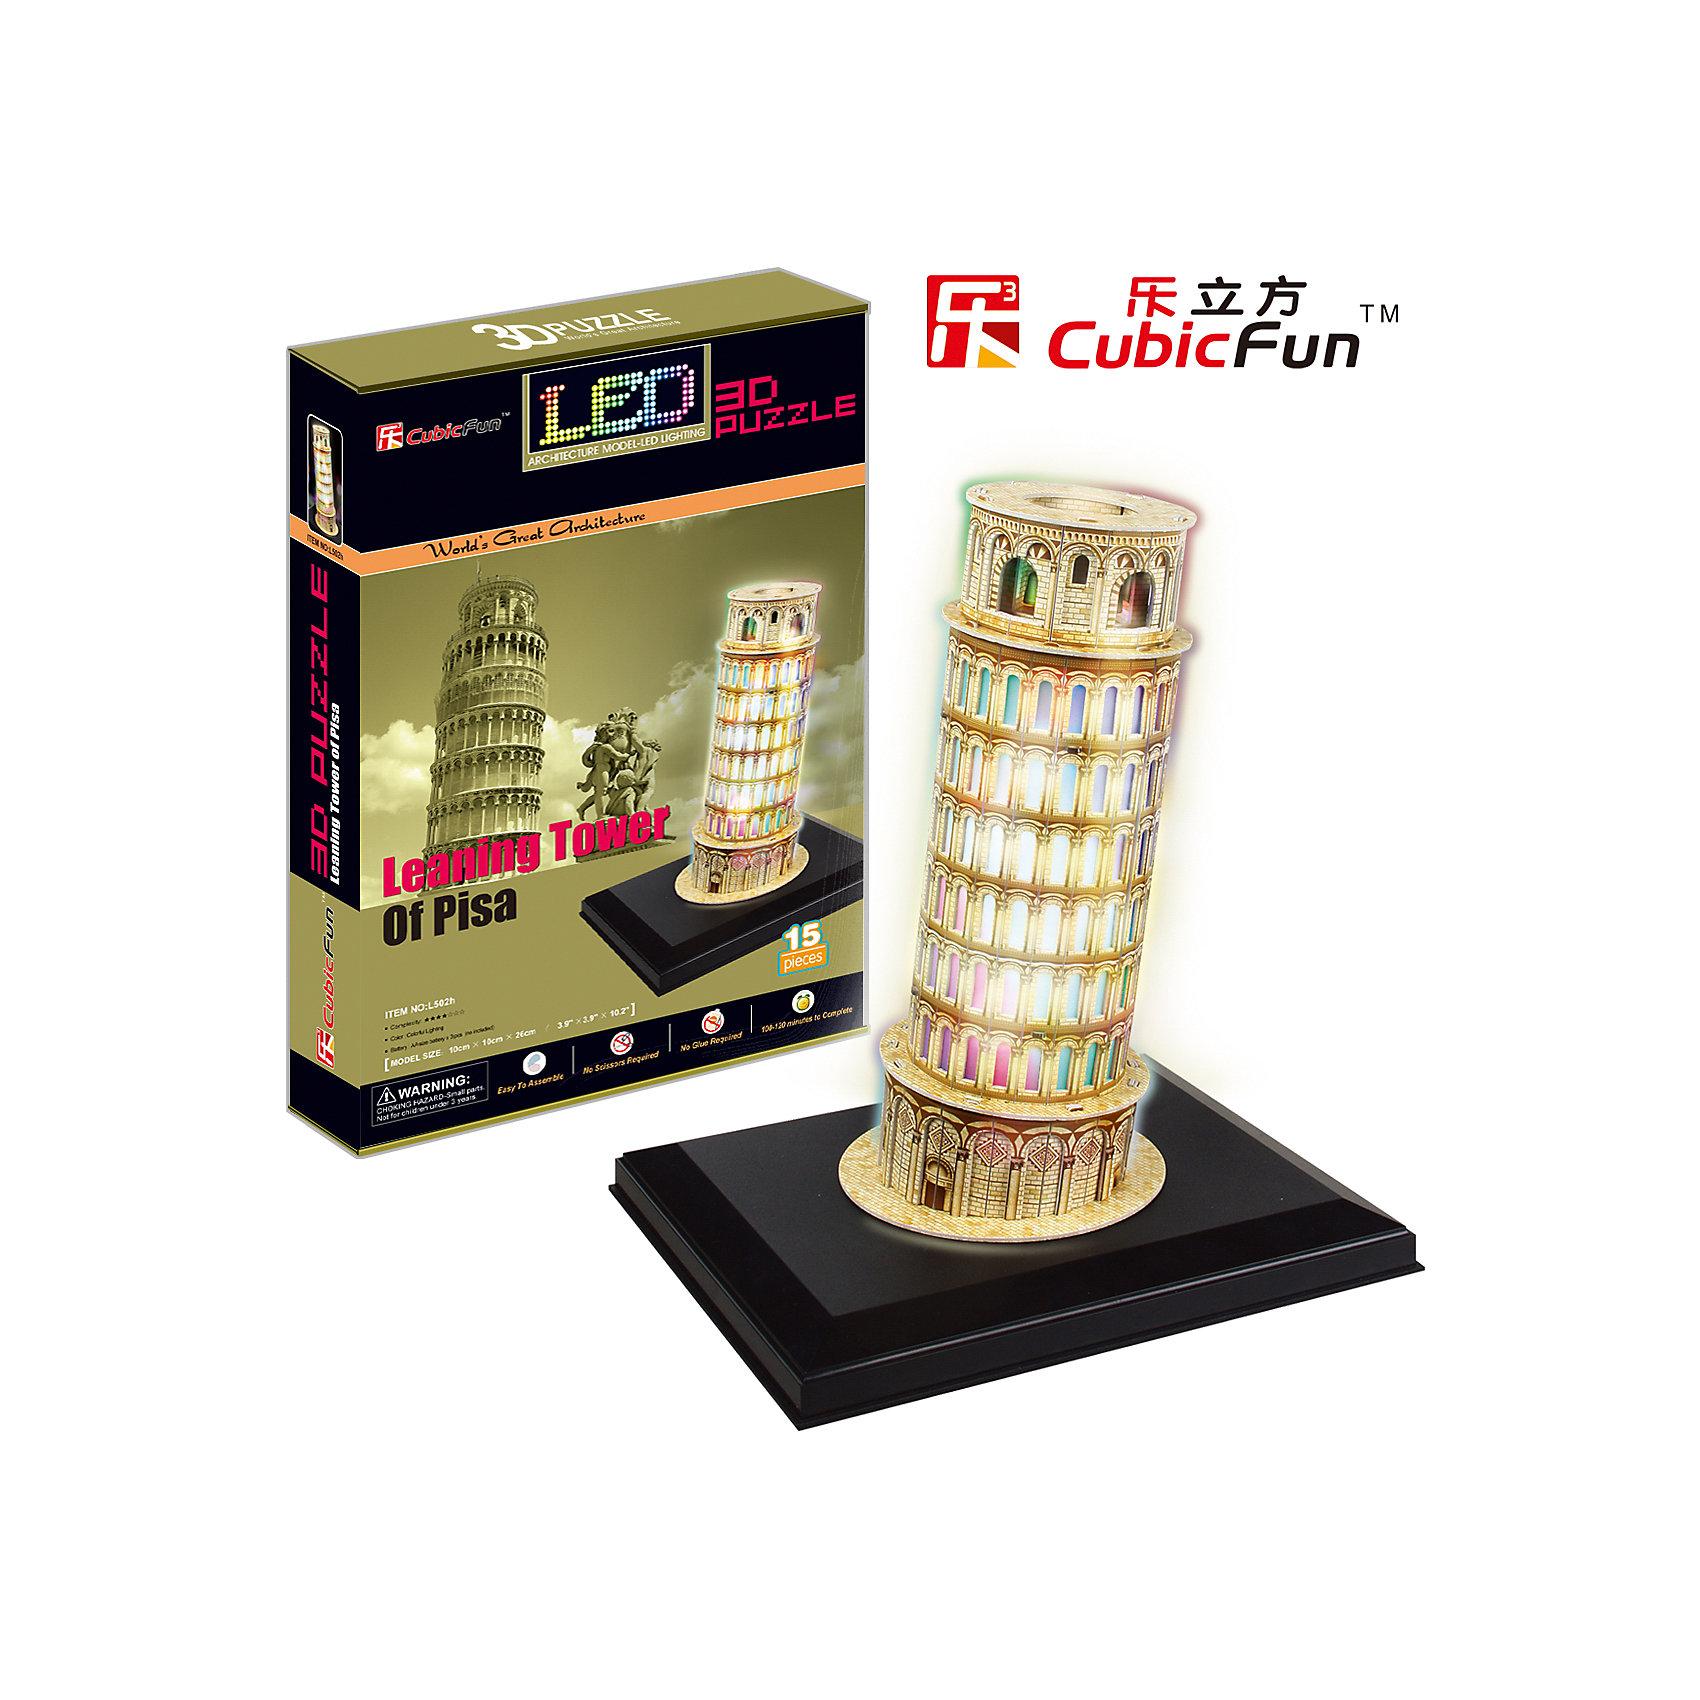 CubicFun Пазл 3D Пизанская башня с иллюминацией (Италия), CubicFun cubicfun 3d пазл эйфелева башня 2 франция cubicfun 33 детали